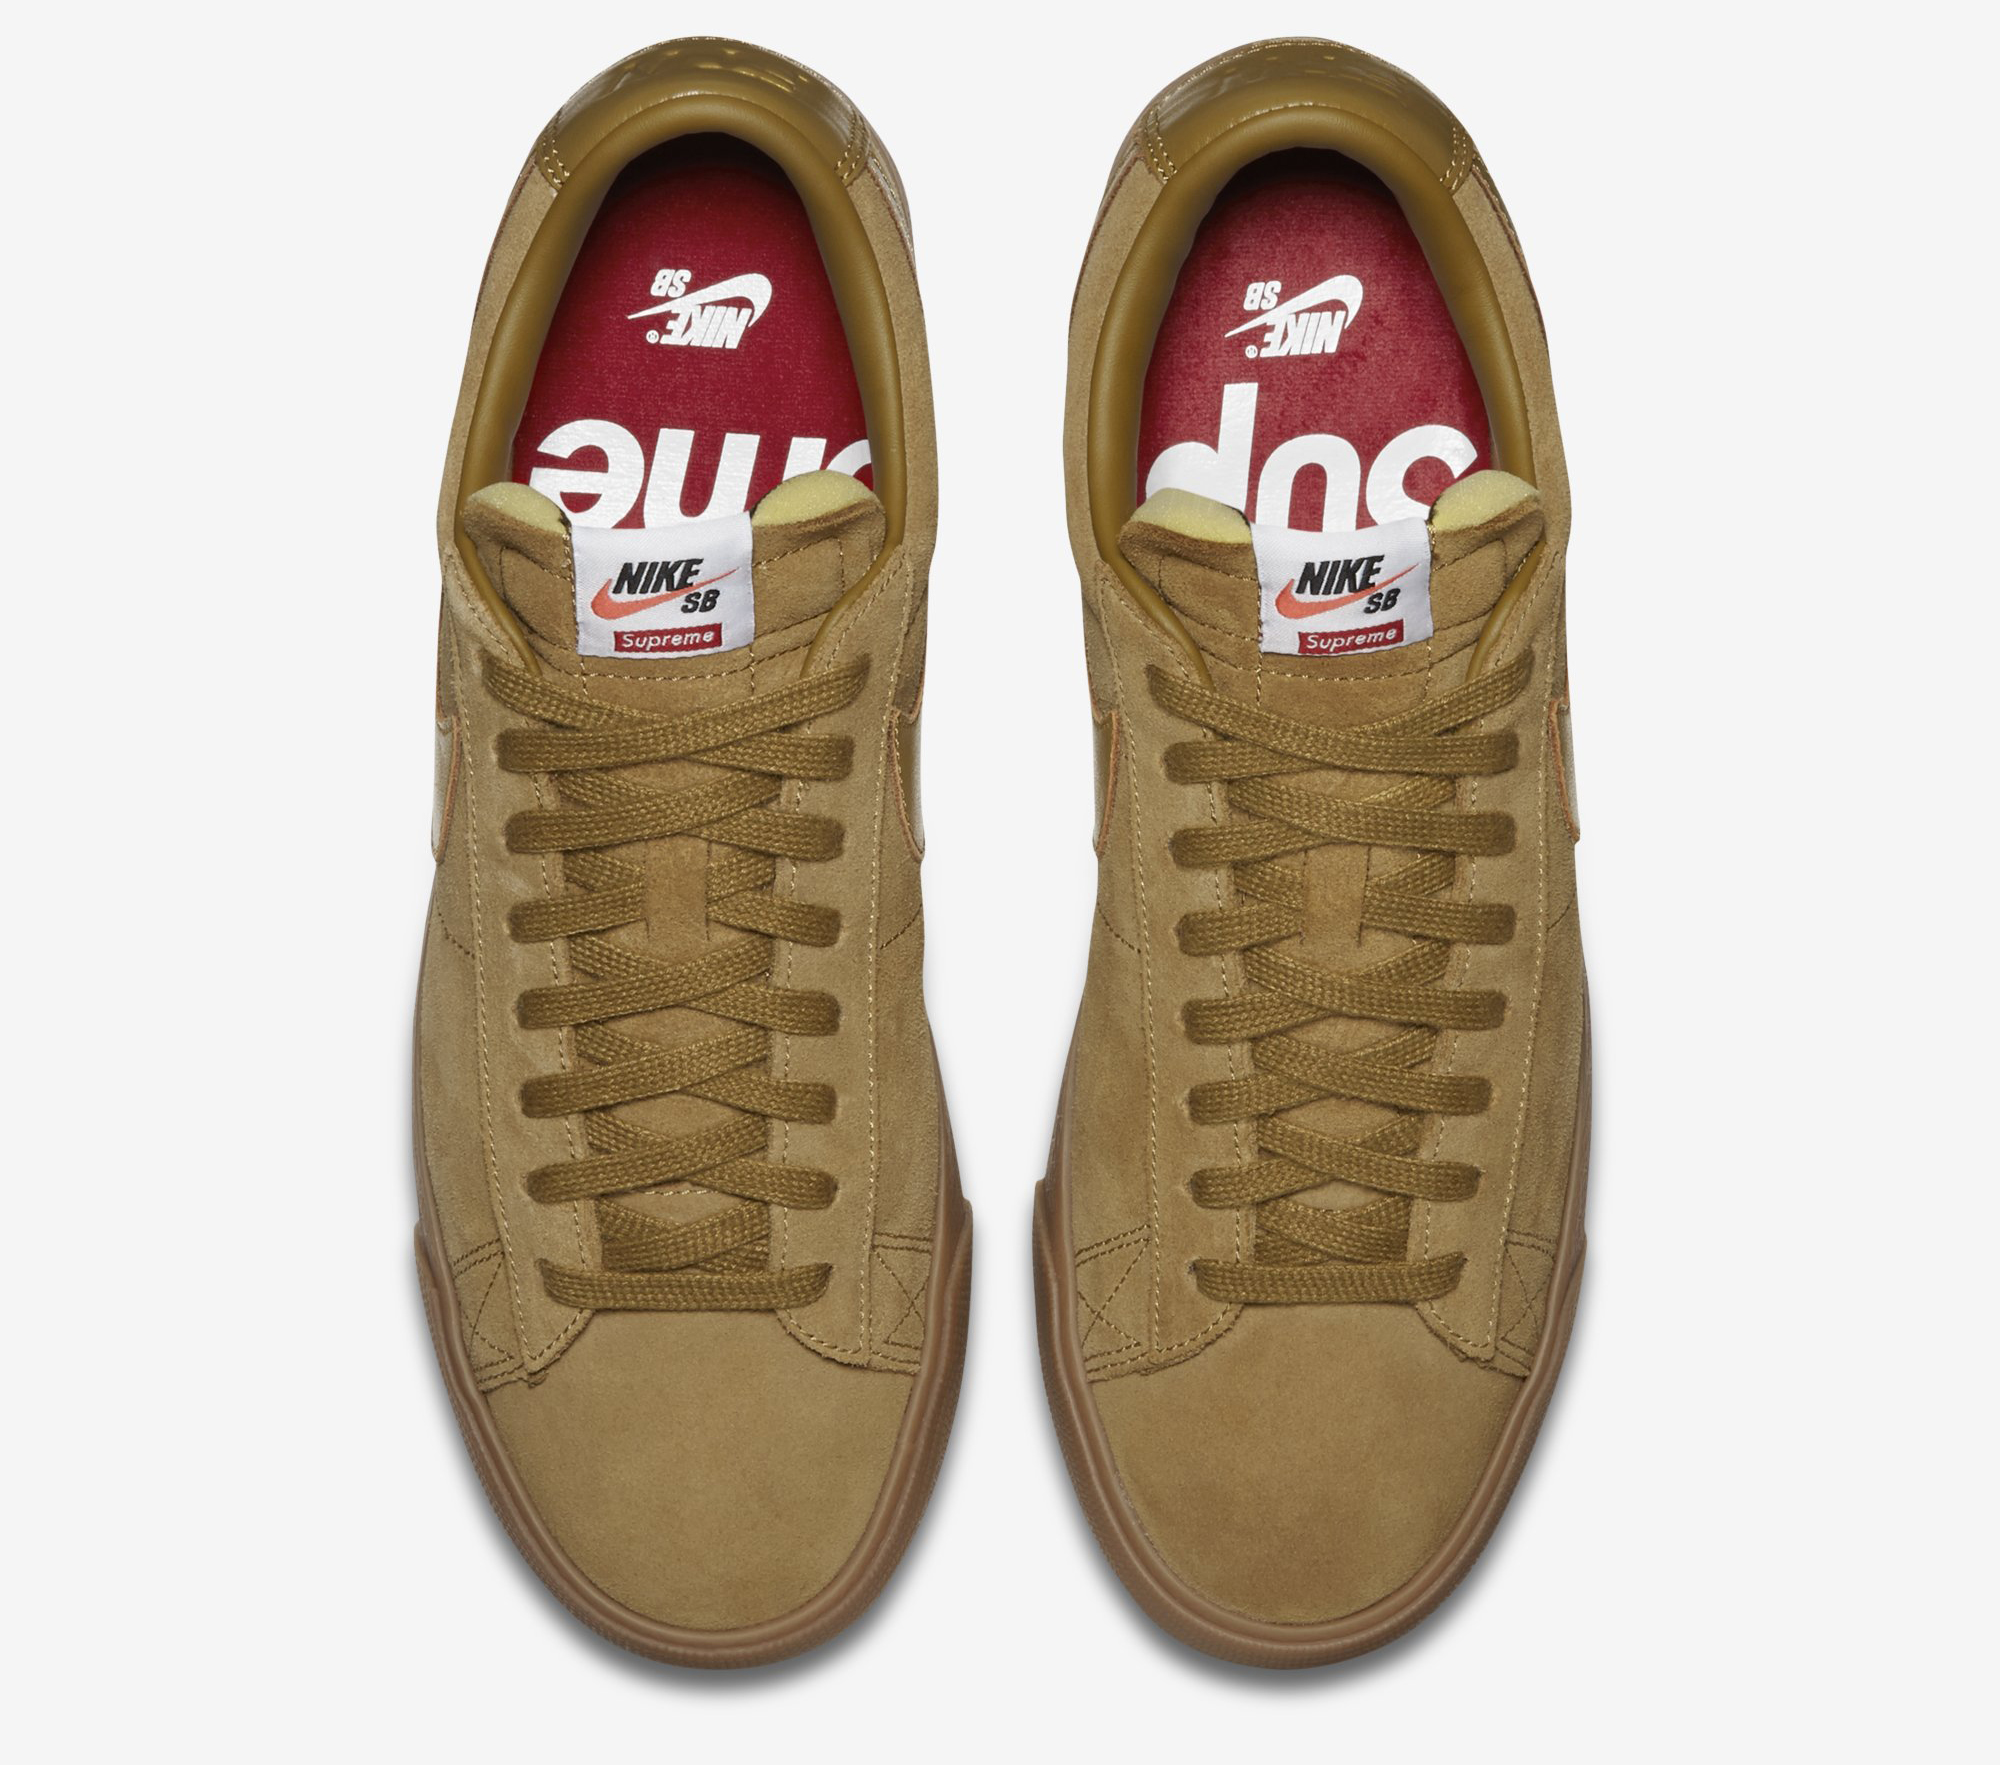 Nike SB Blazer Low GT FTW 16 BeigeTan 716890 229 Online UK